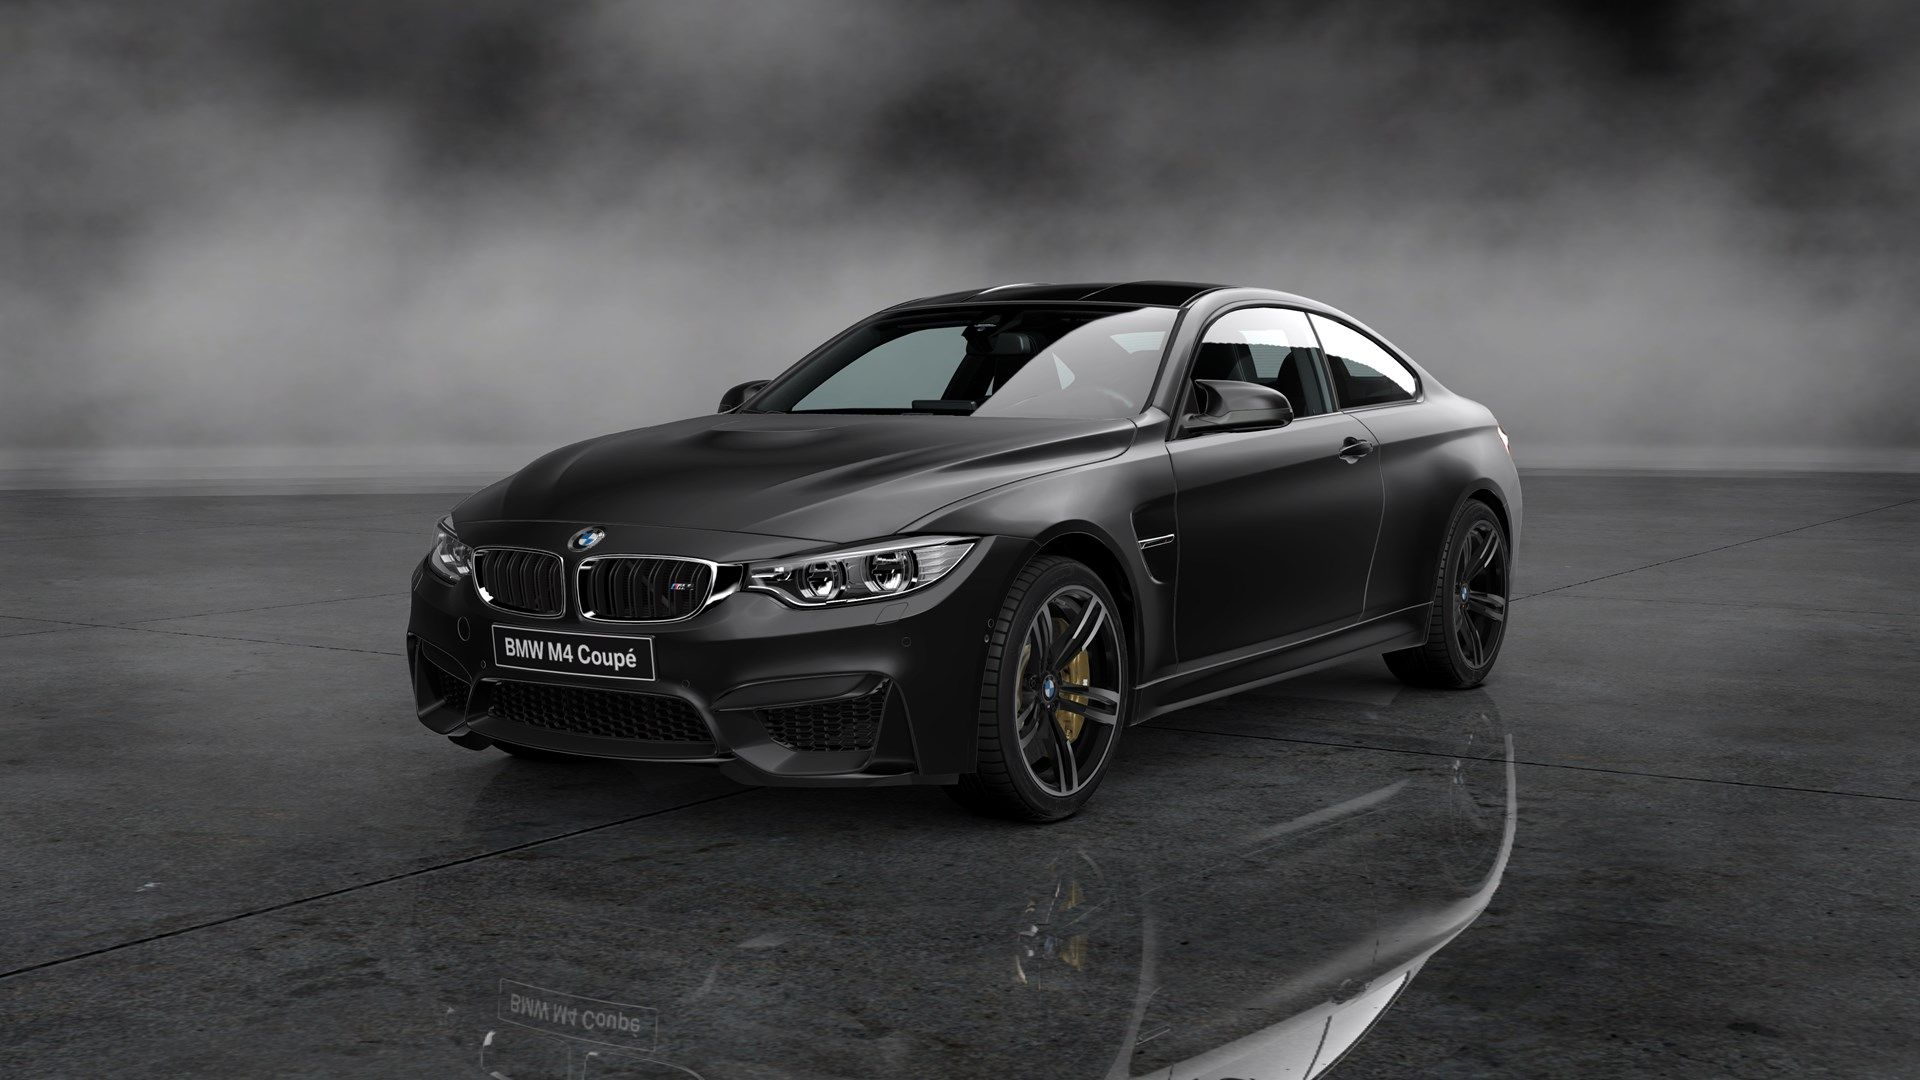 BMW M Black BMW Pinterest Bmw M BMW And Cars - Black bmw m4